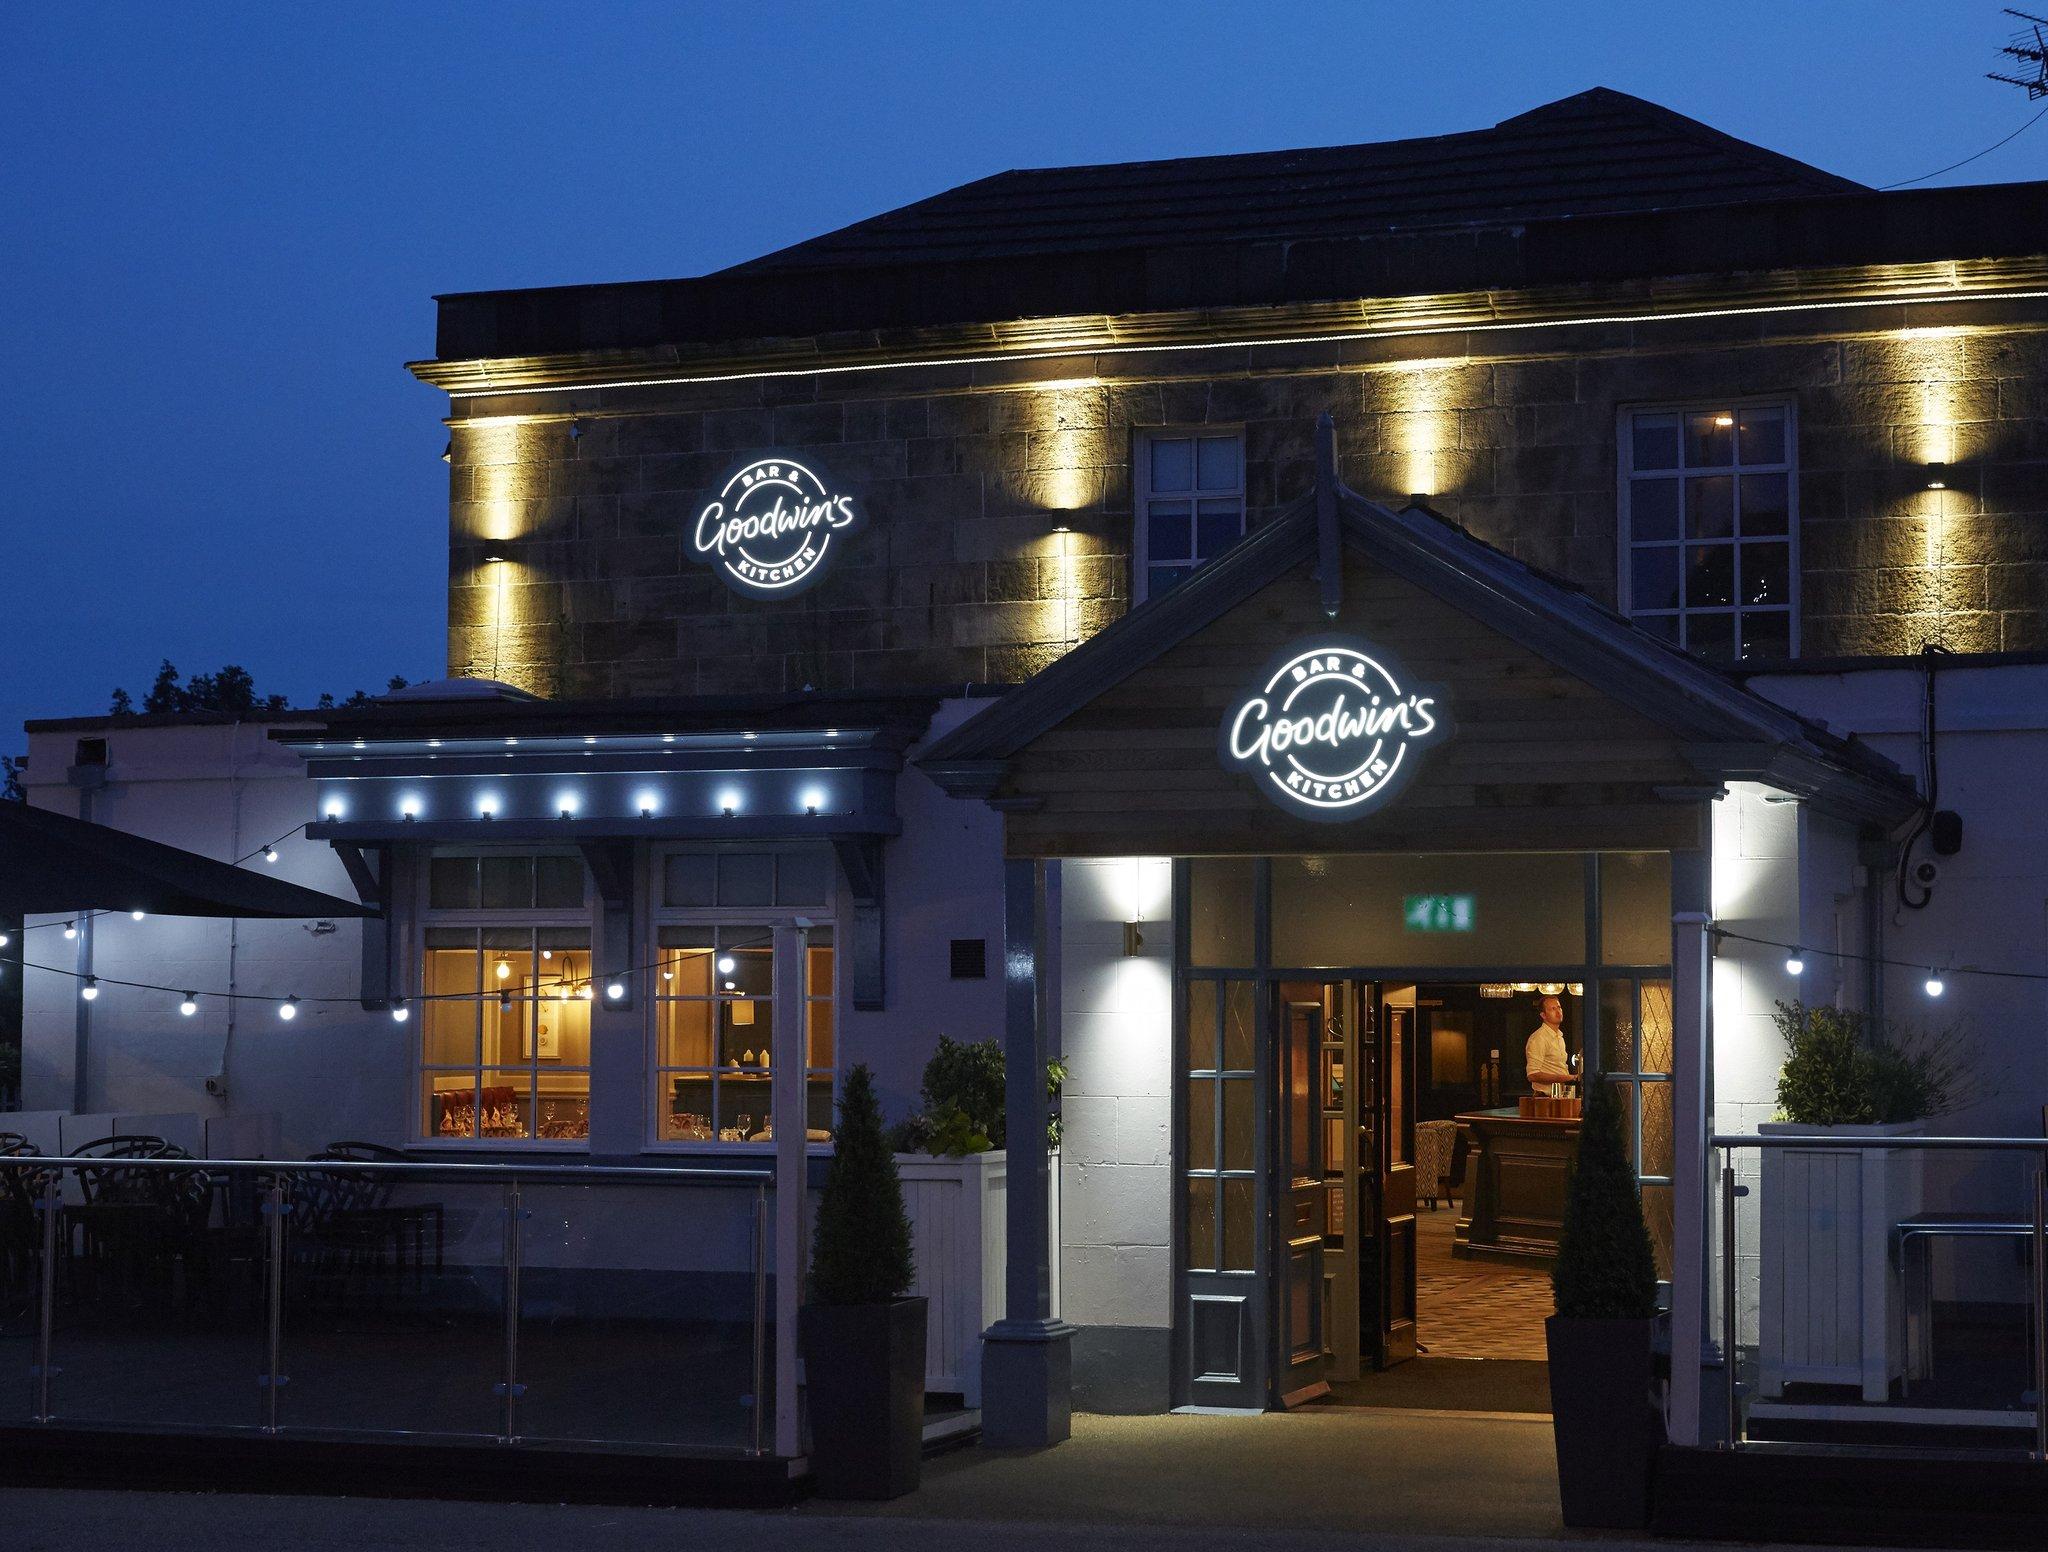 Hartwood Hall Hotel & Restaurant